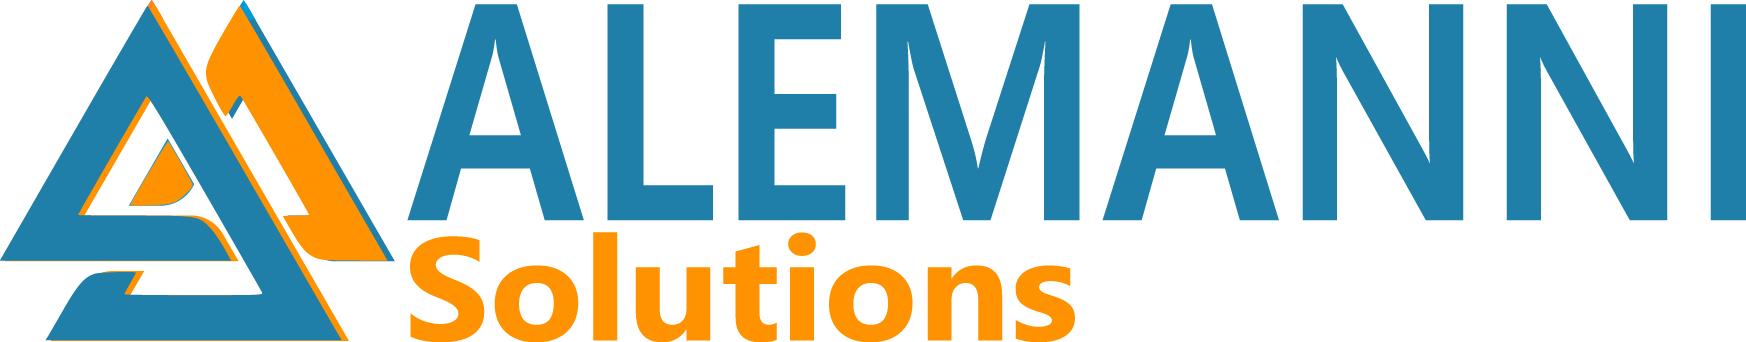 Alemanni Solutions